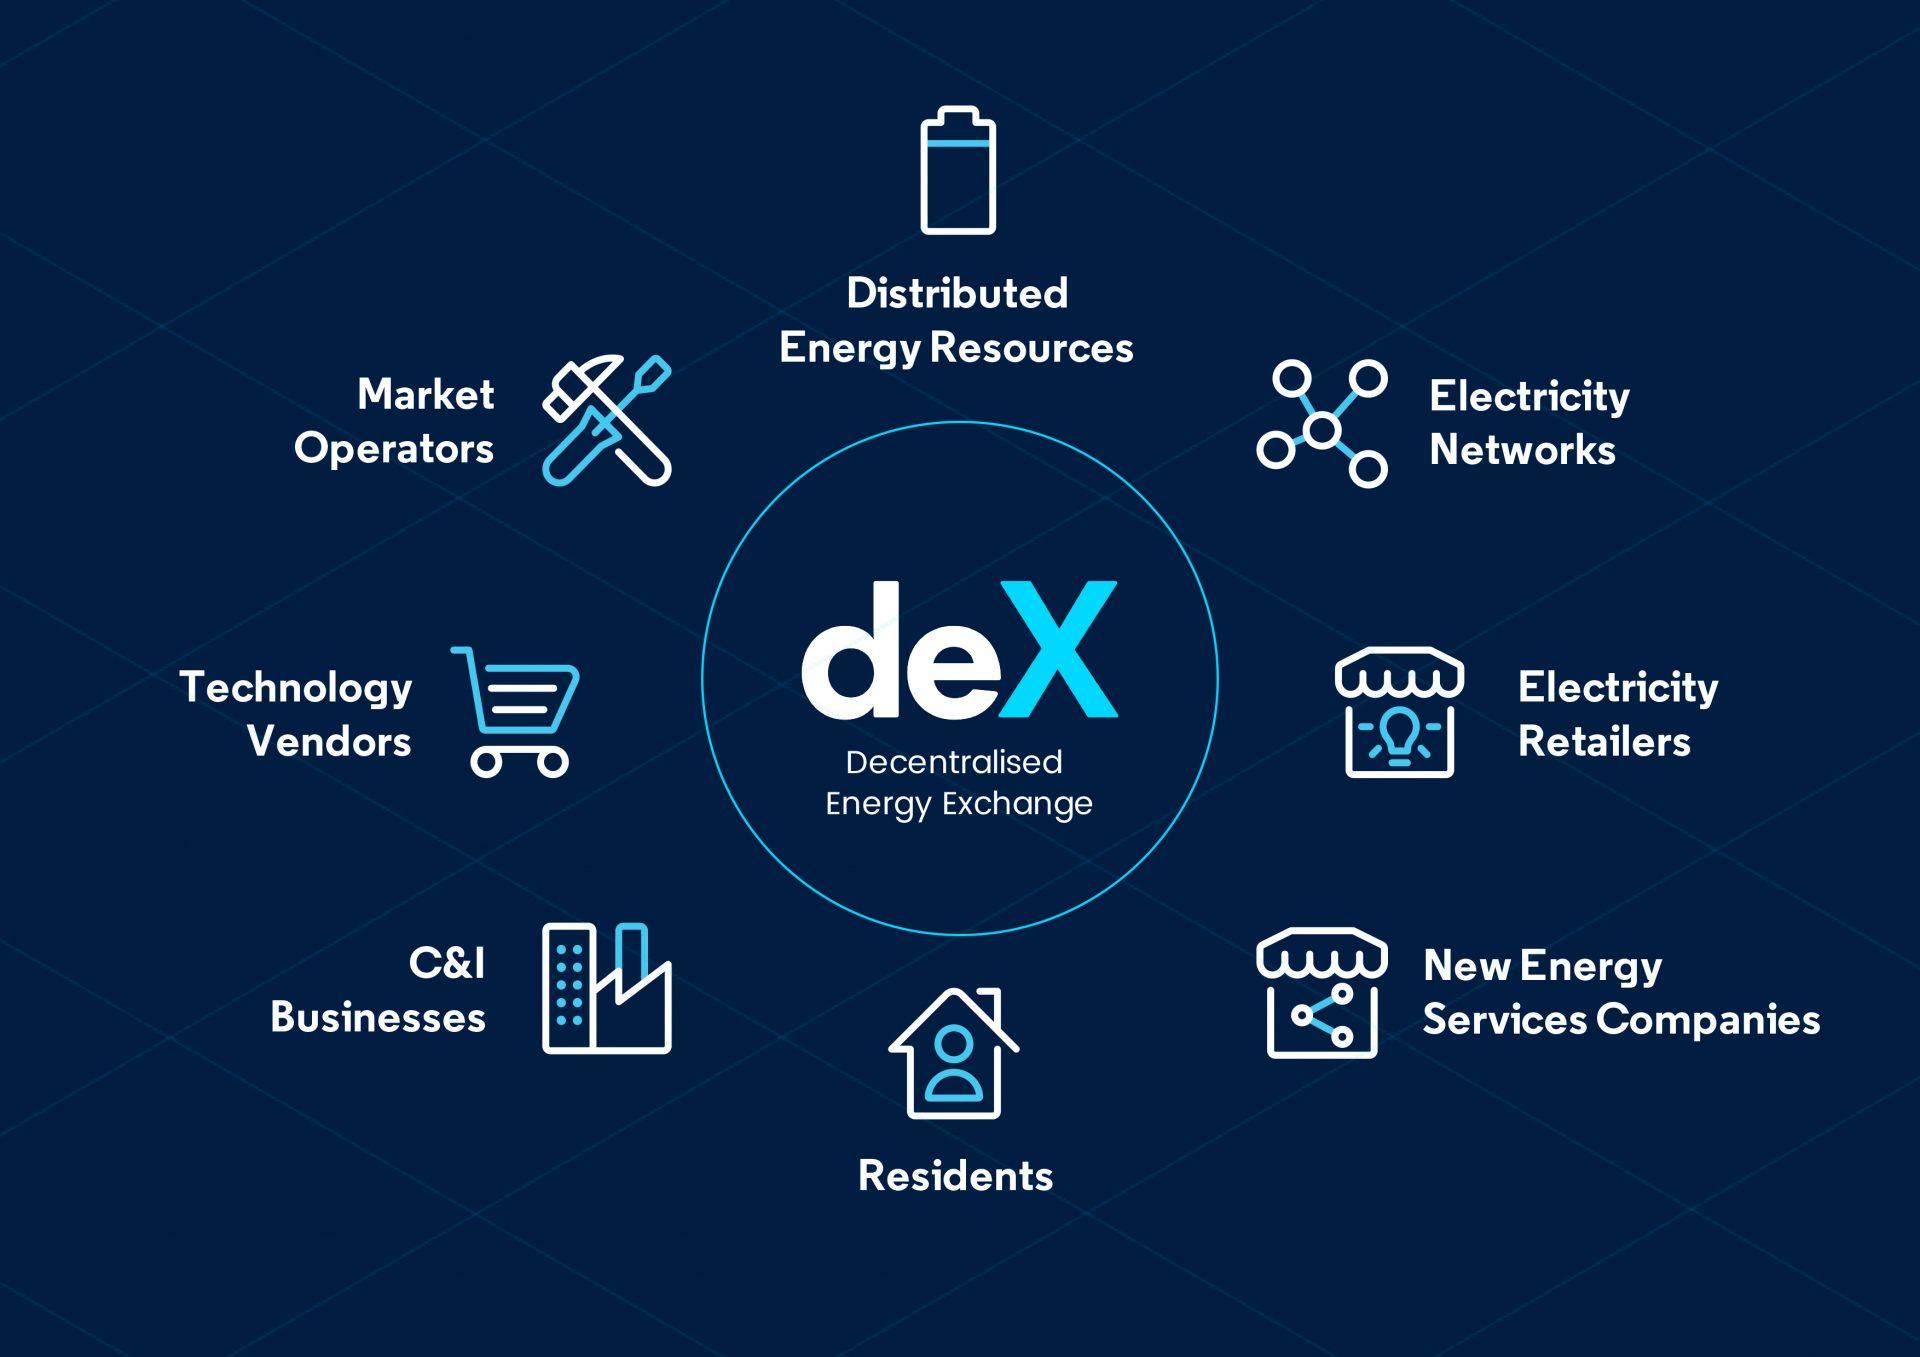 deX market participants diagram